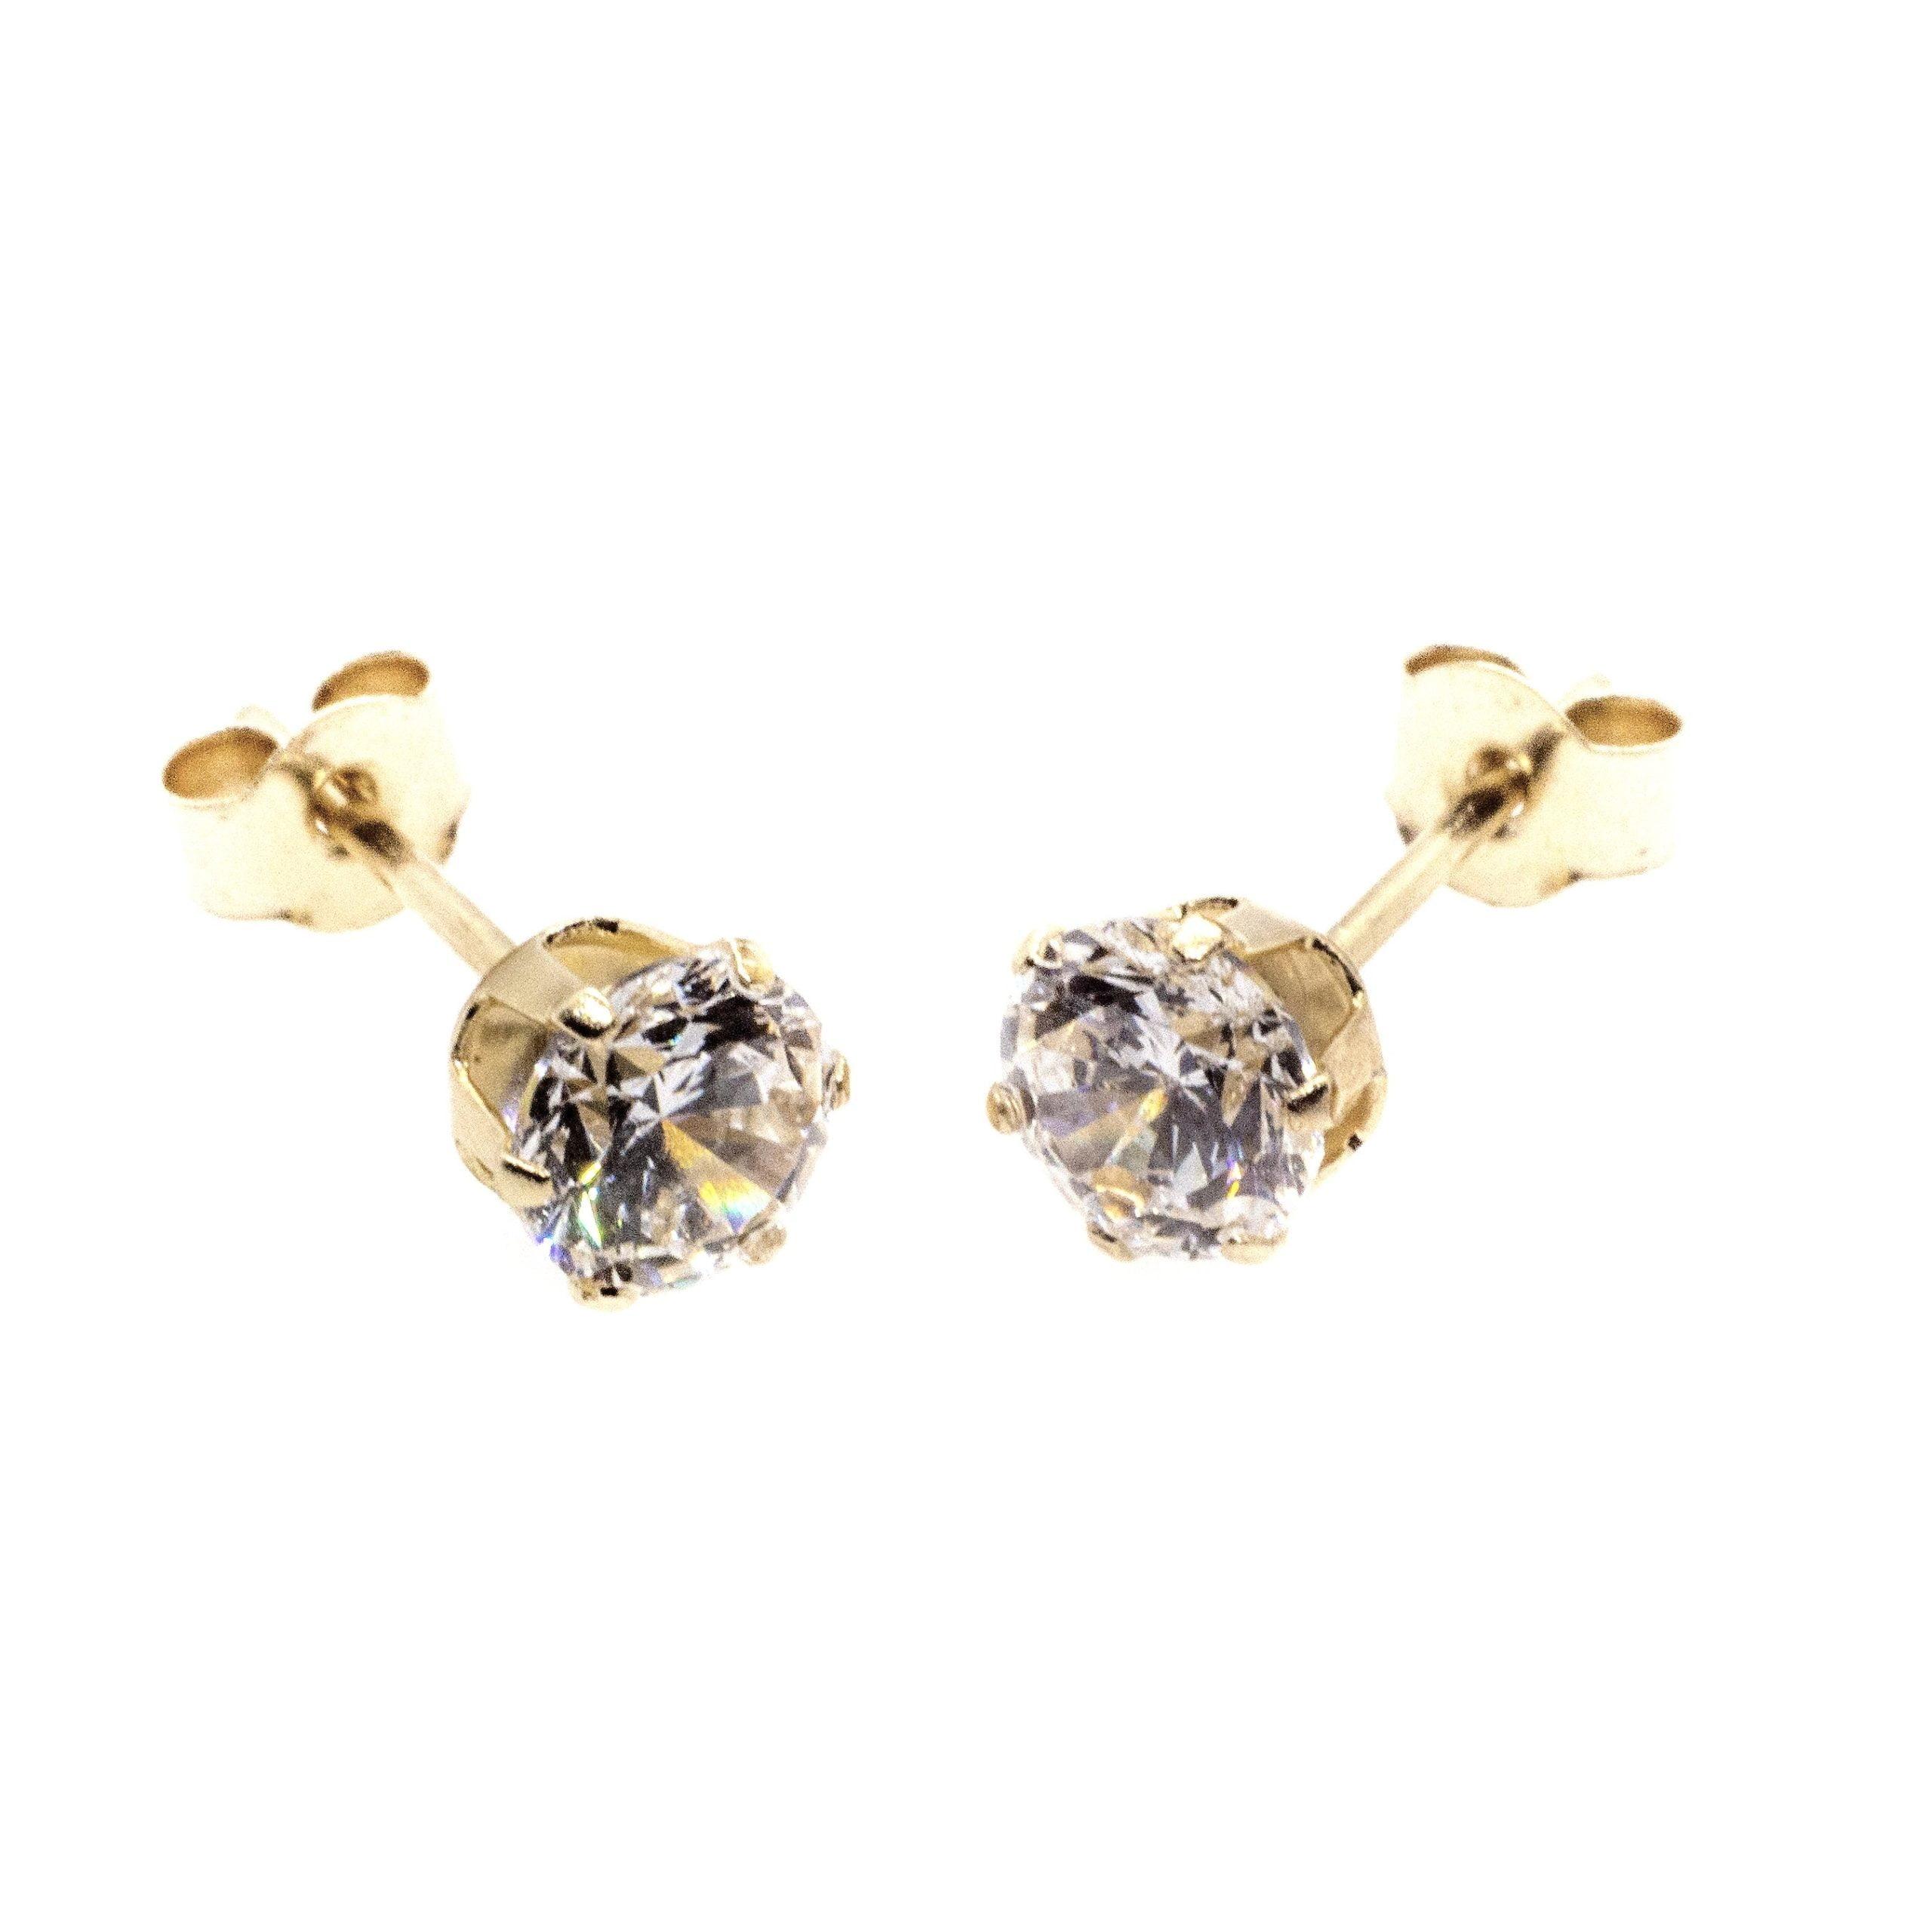 3mm CZ stud earrings 9ct yellow gold alt 3